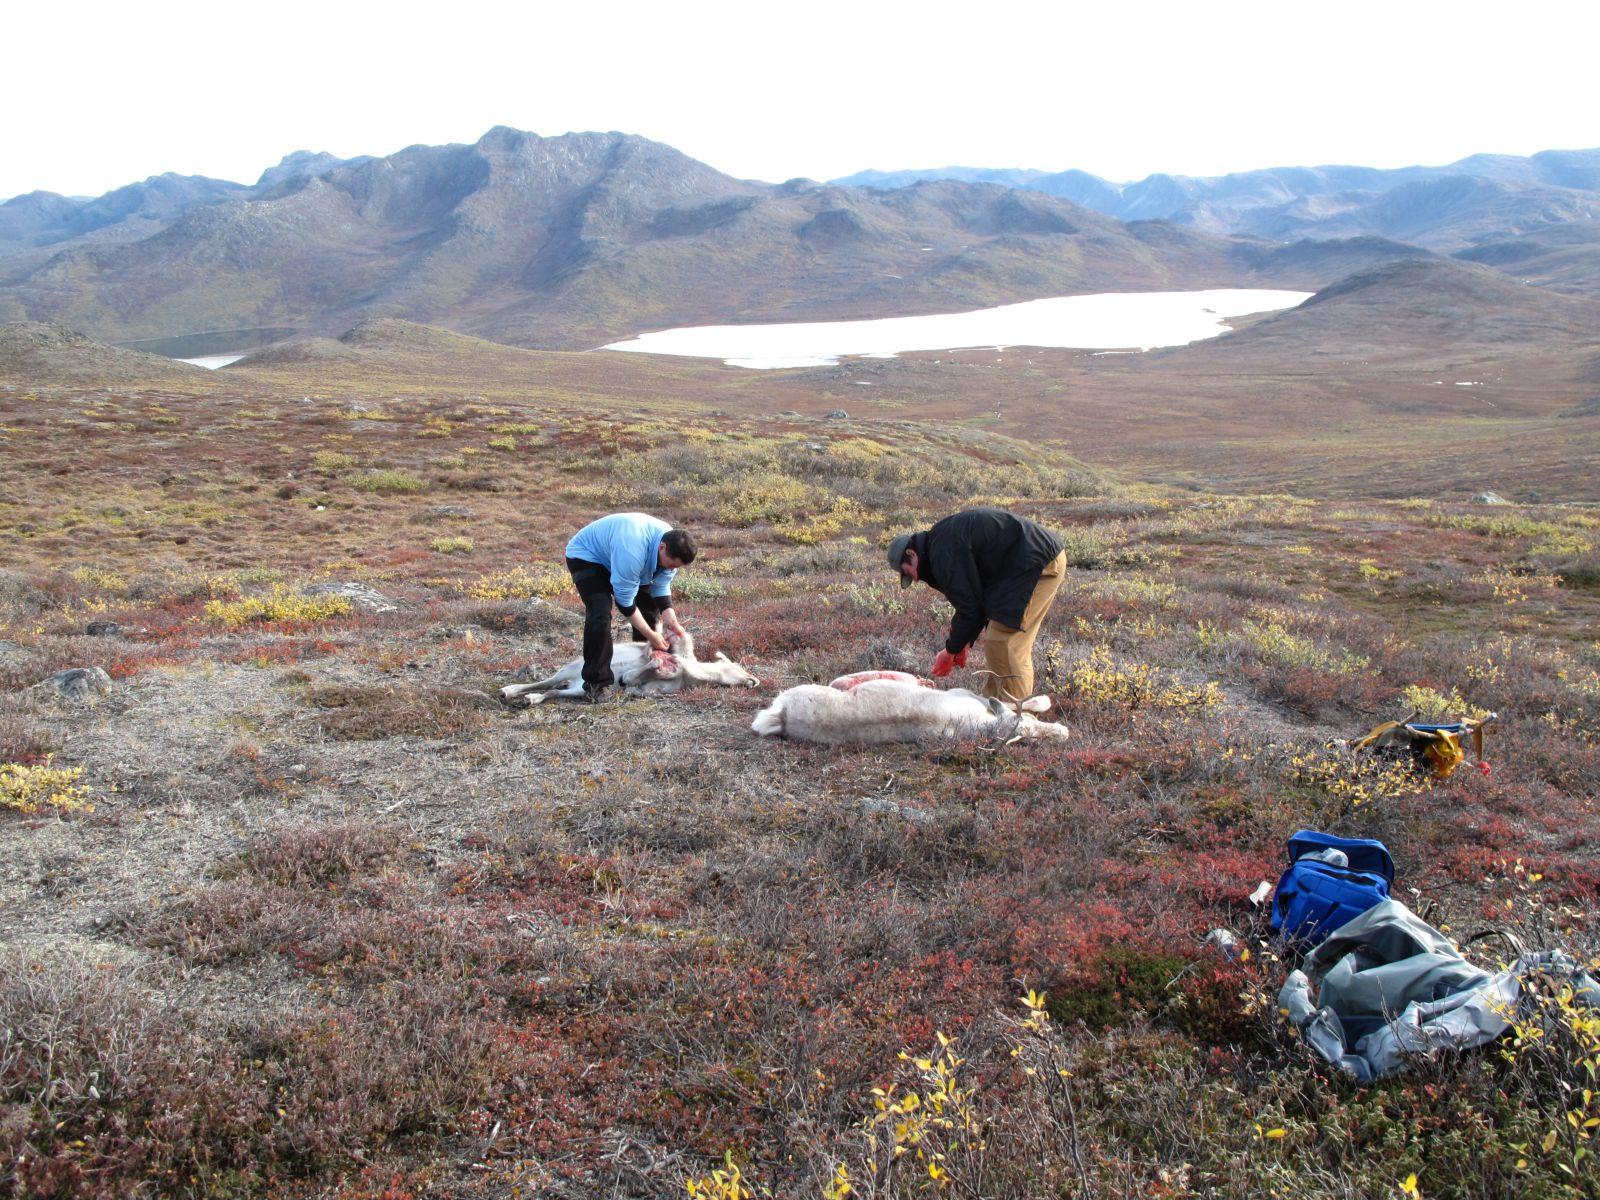 2010-09-25-1222_-_Jesper Eugenius Labansen; Rensdyr; Slagtning; Søren Labansen